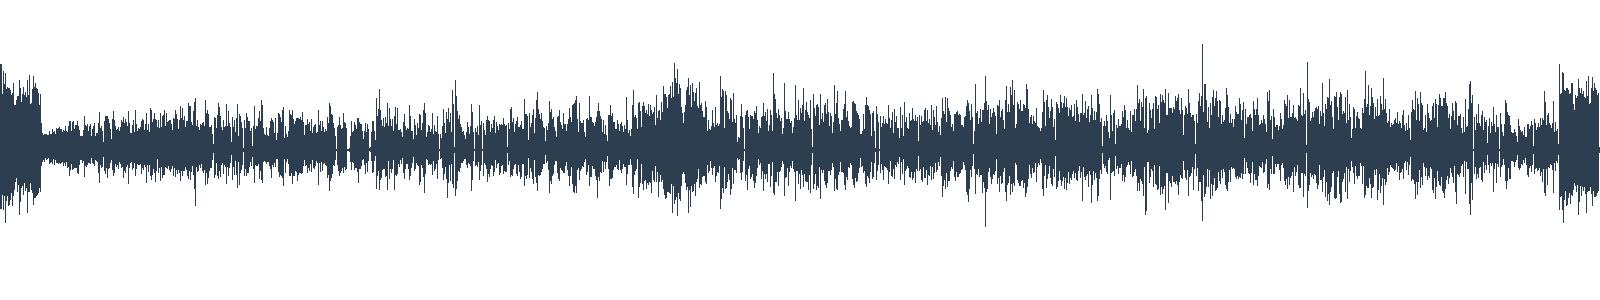 O.Kuffa - Kázeň 12.5.2019 Liptovské Sliače waveform